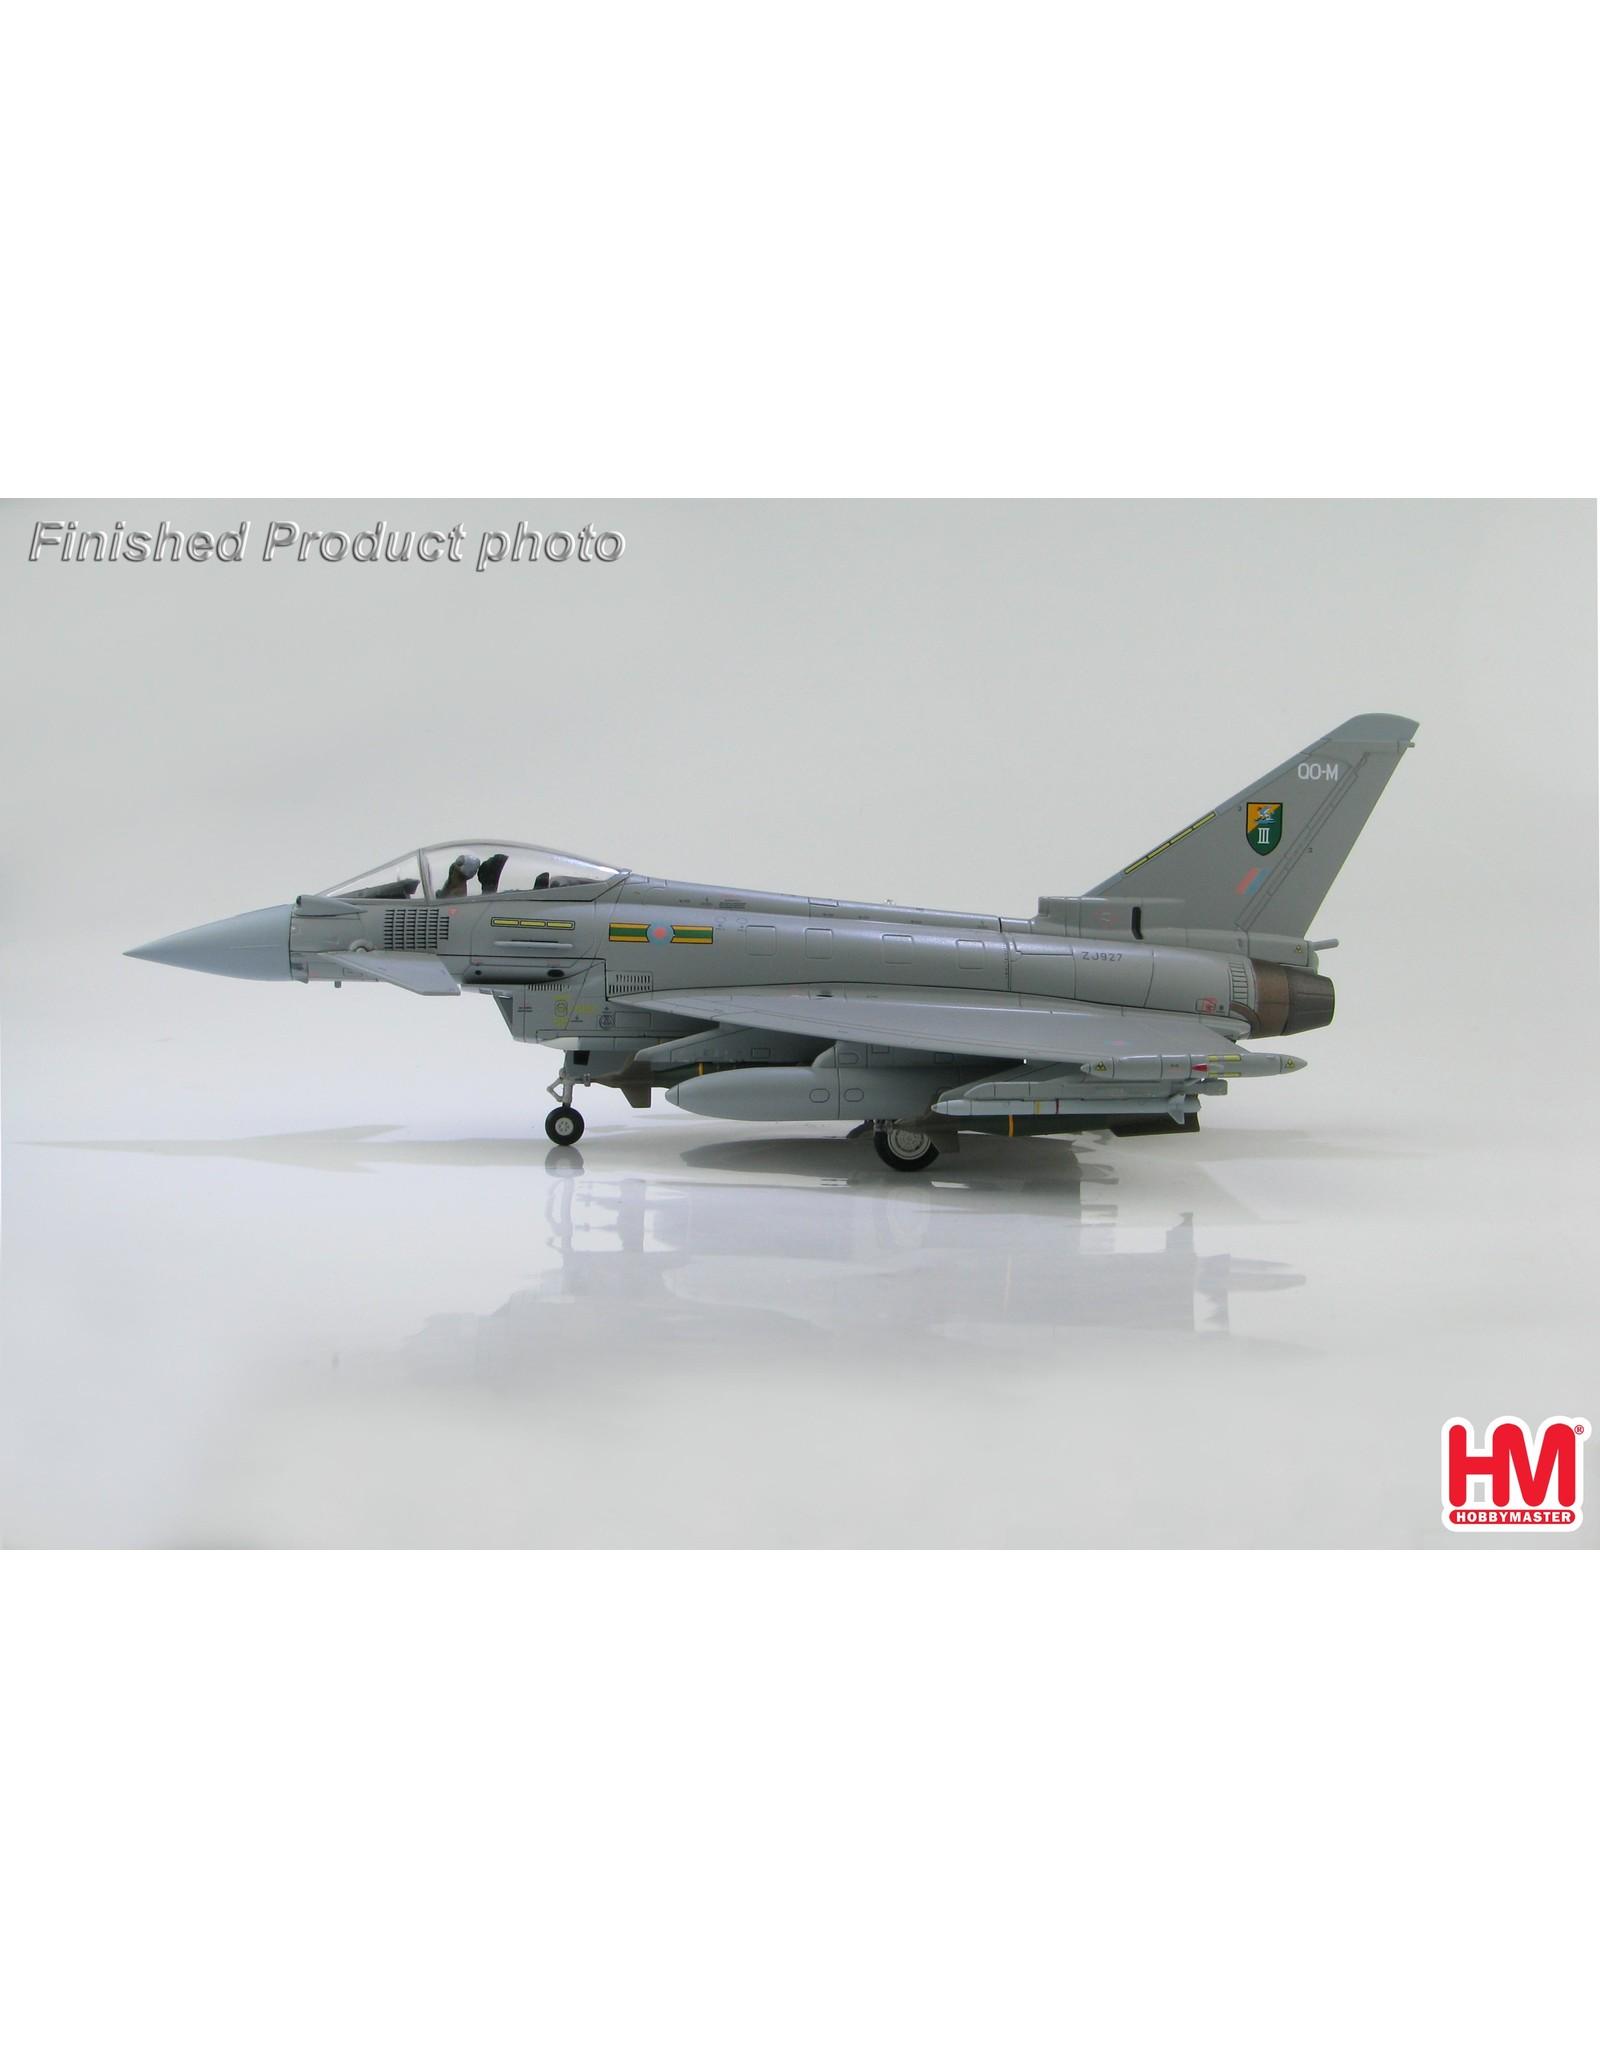 HM Eurofighter Typhoon F.2 RAF Libya 2011